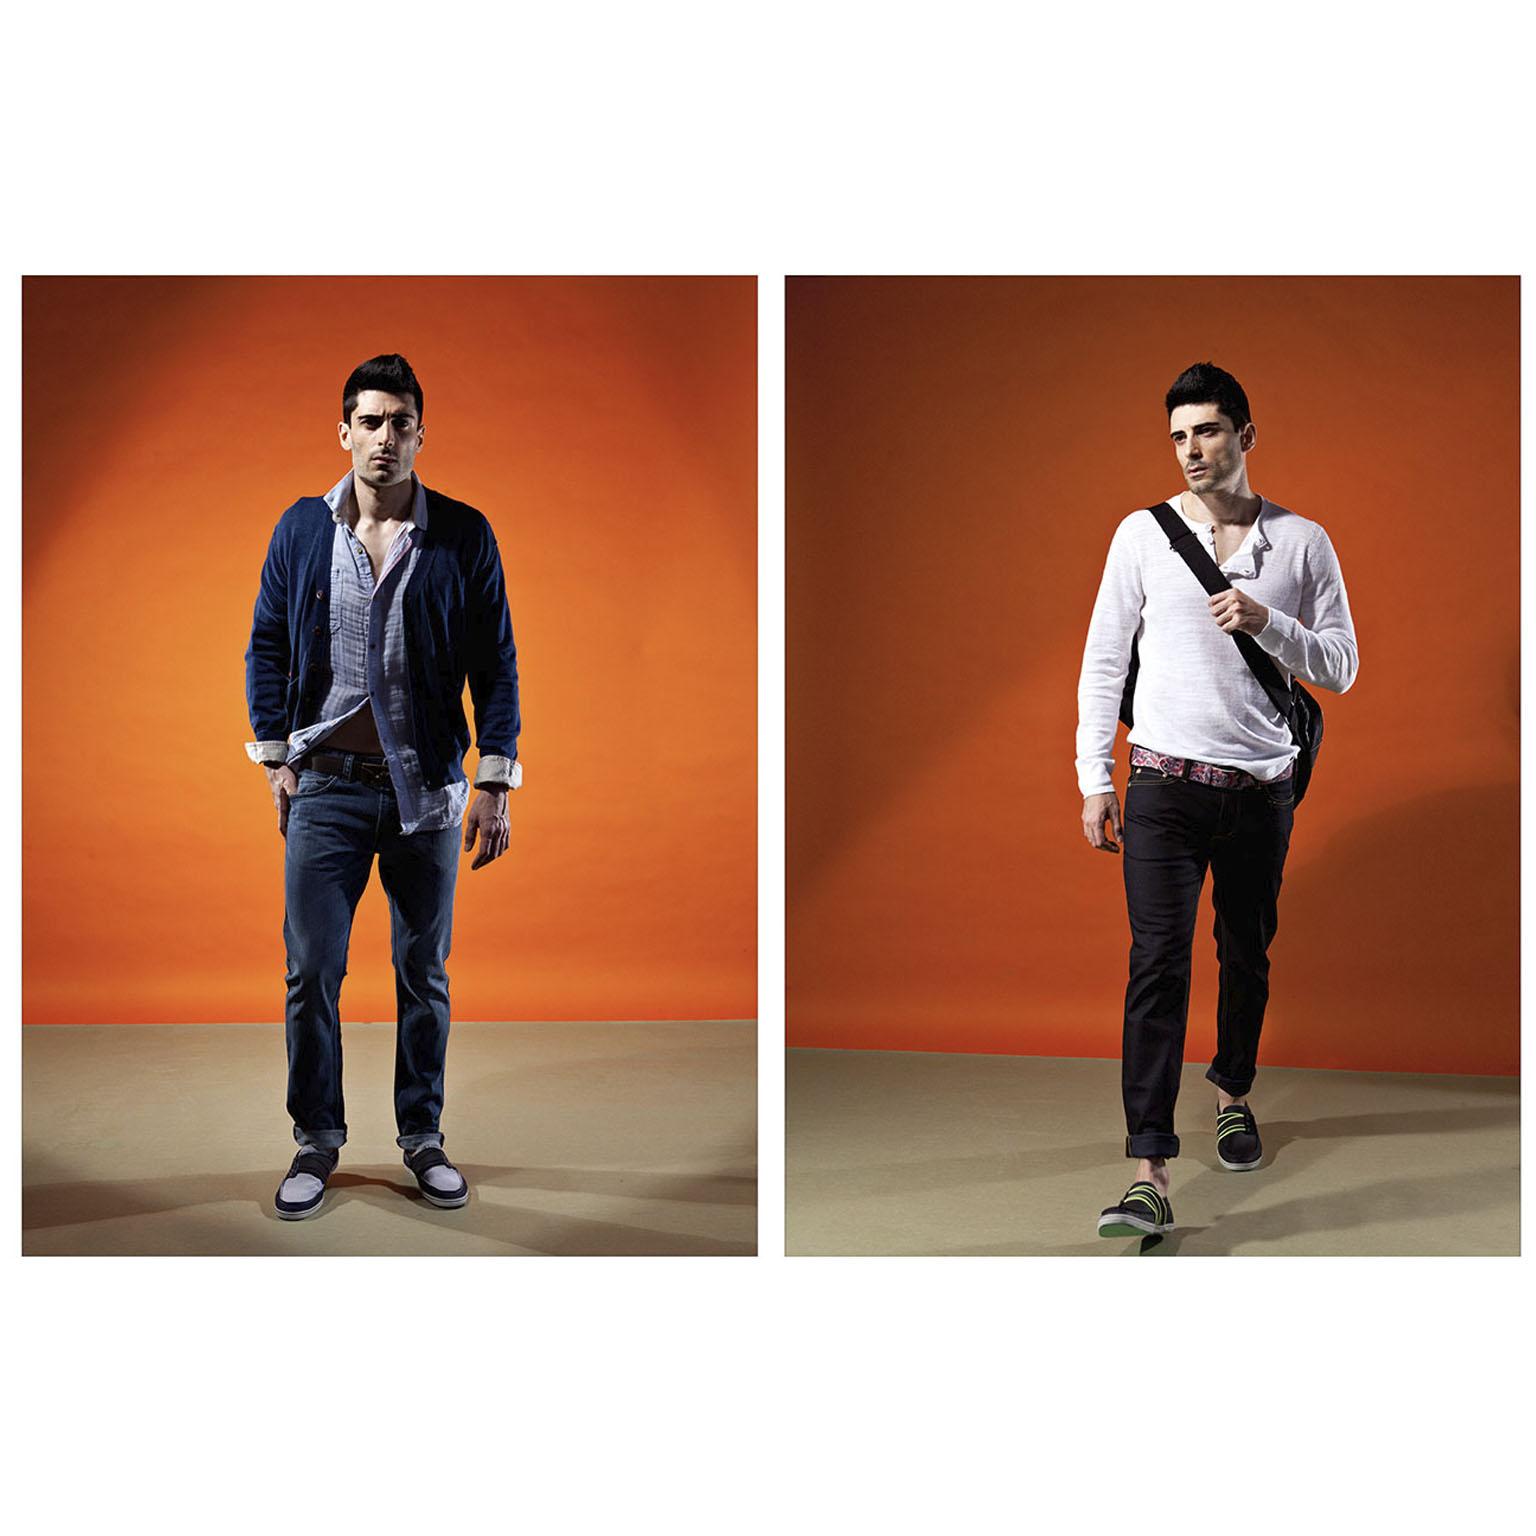 Toronto-Fitness-Model-Agency-Fitness-Casual-Commercial-Simon-Lazzerini-Headshot-Model-Lifestyle